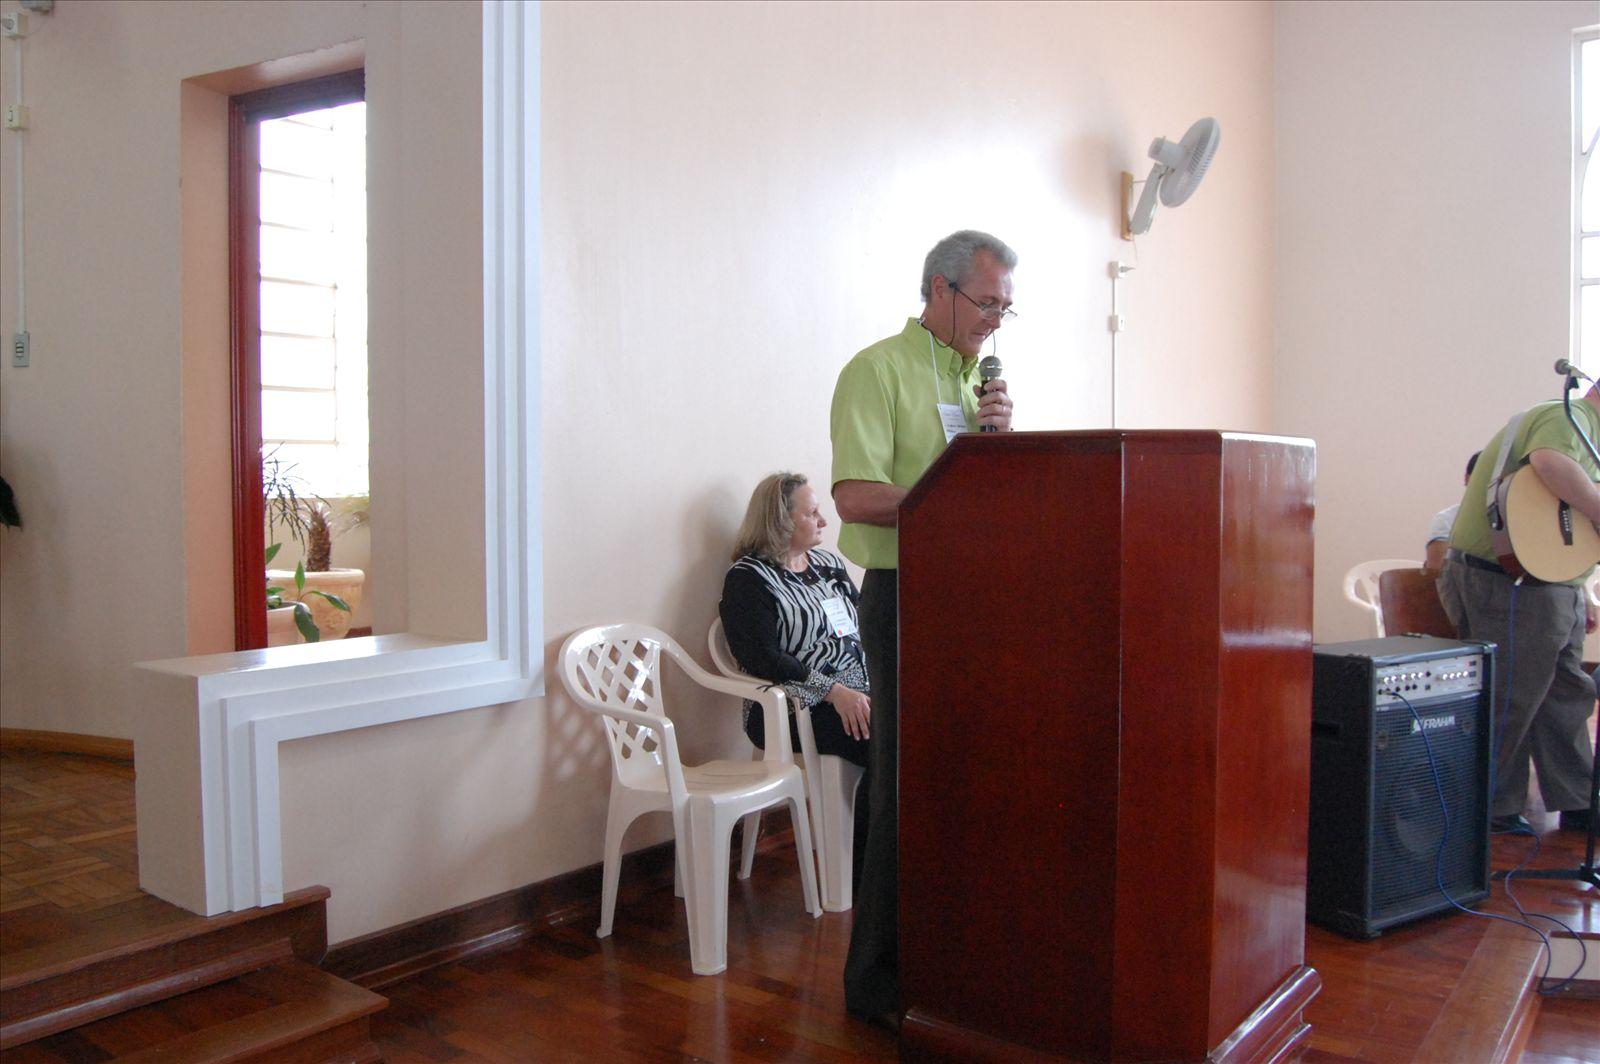 2º Encontro Família Cornelli - 11.10.2009 (136)_0